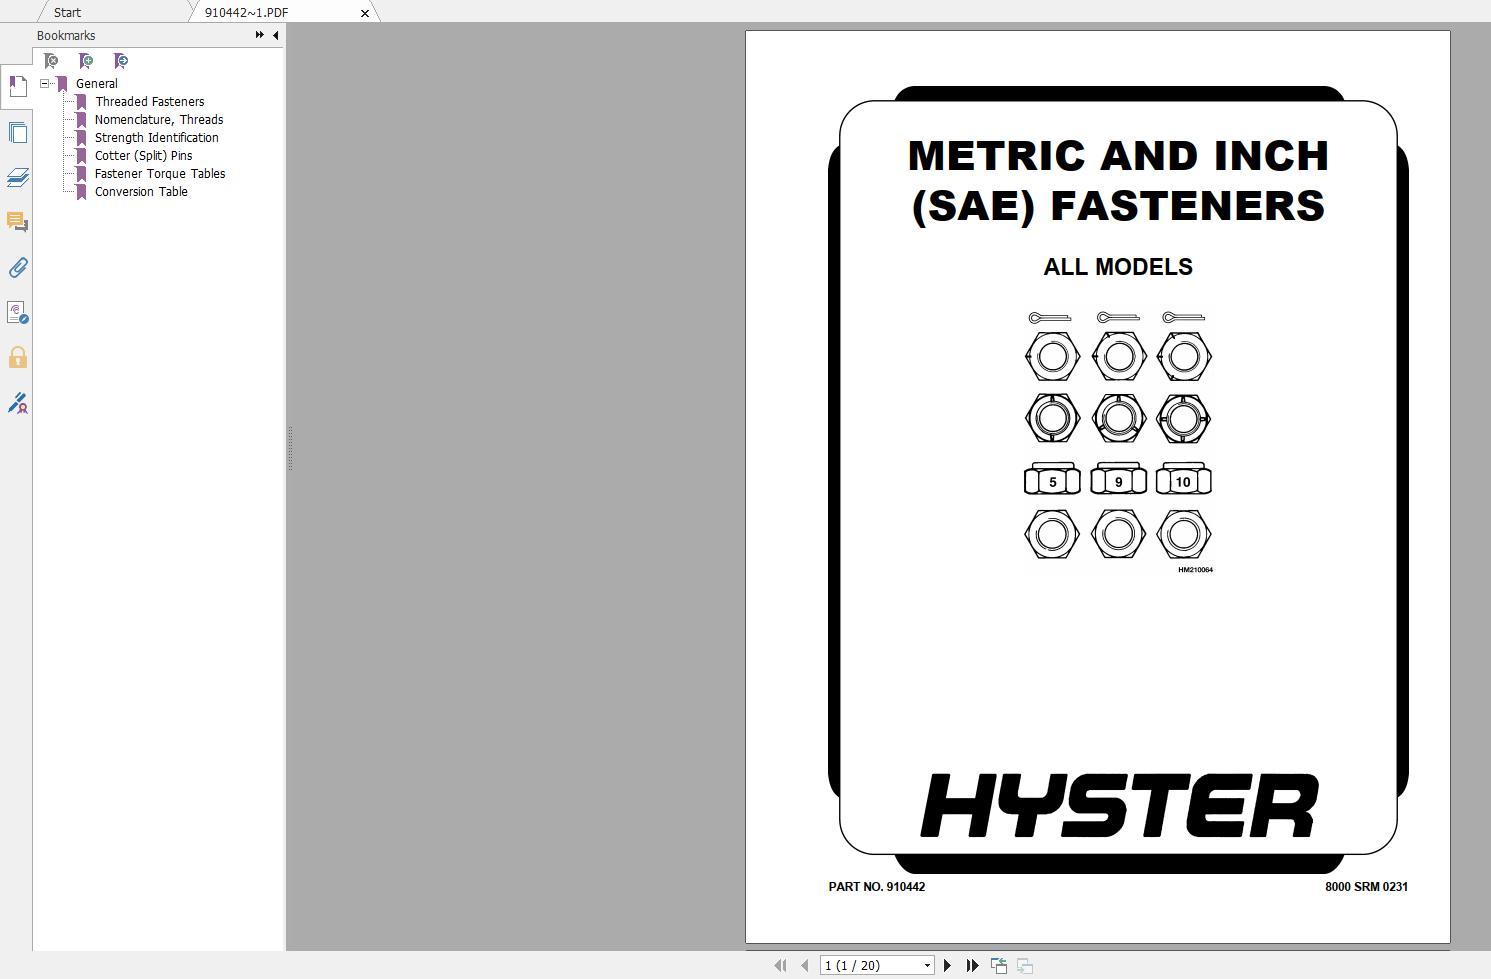 Hyster_Forklift_Class_4_Internal_Combustion_Engine_Trucks_Repair_Manuals6